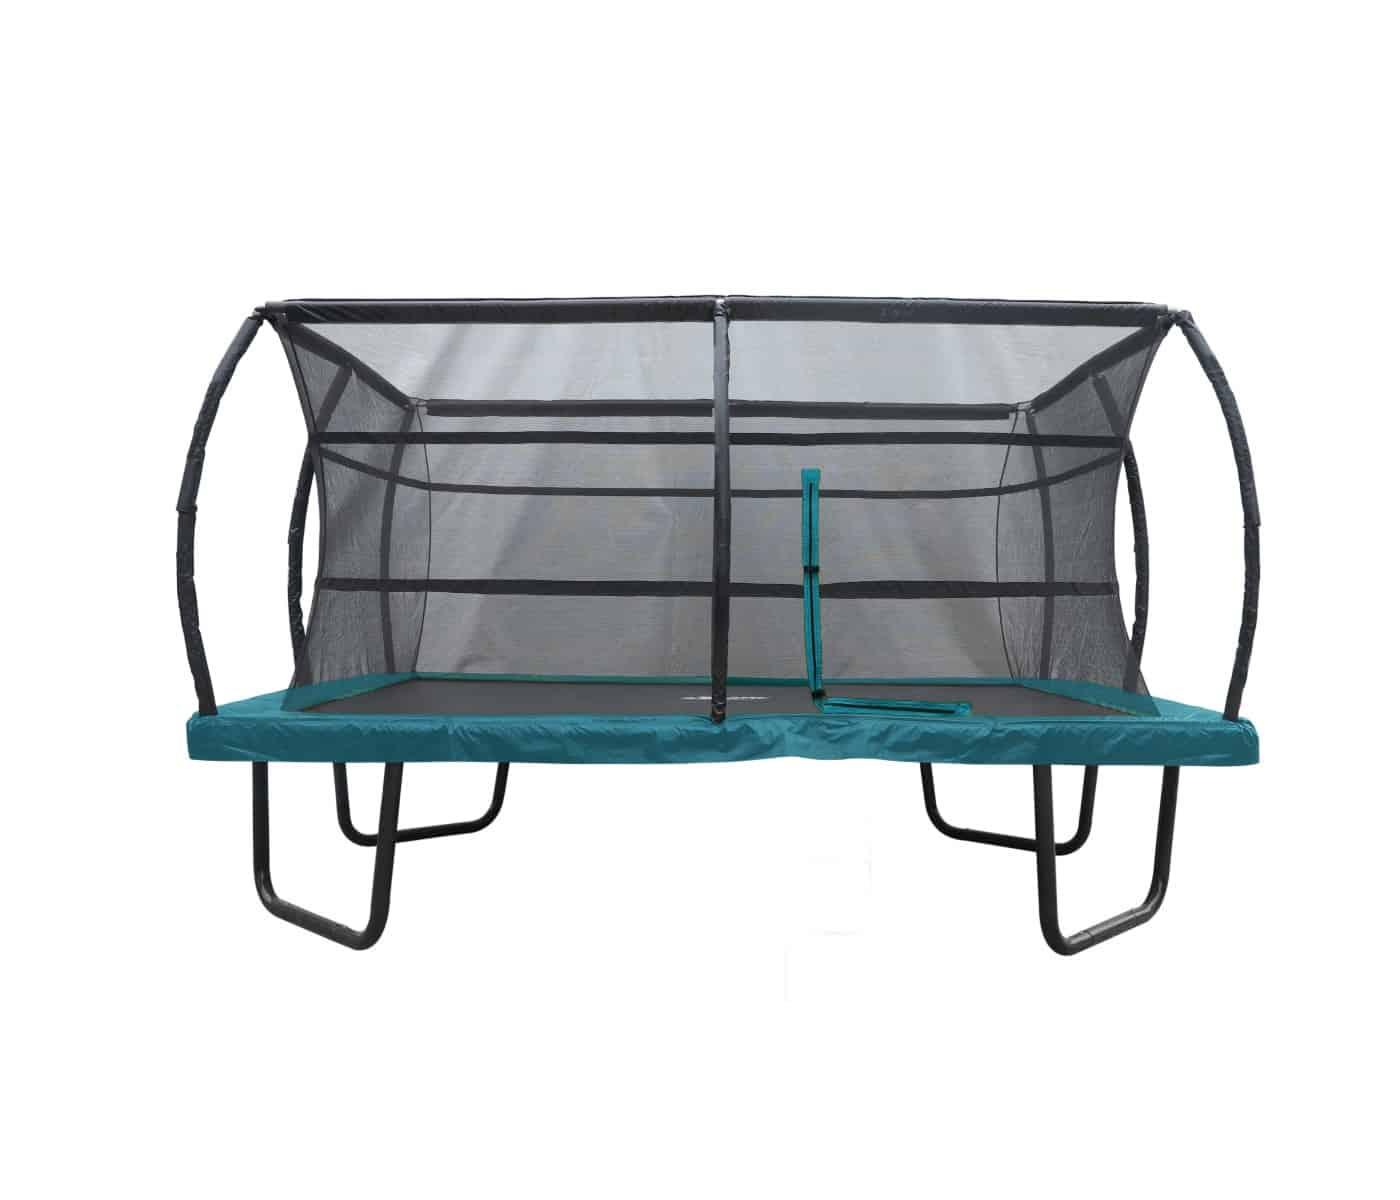 Topnotch Firkantet trampolin (Guide) Fordele ved firkantede trampoliner? YK-87